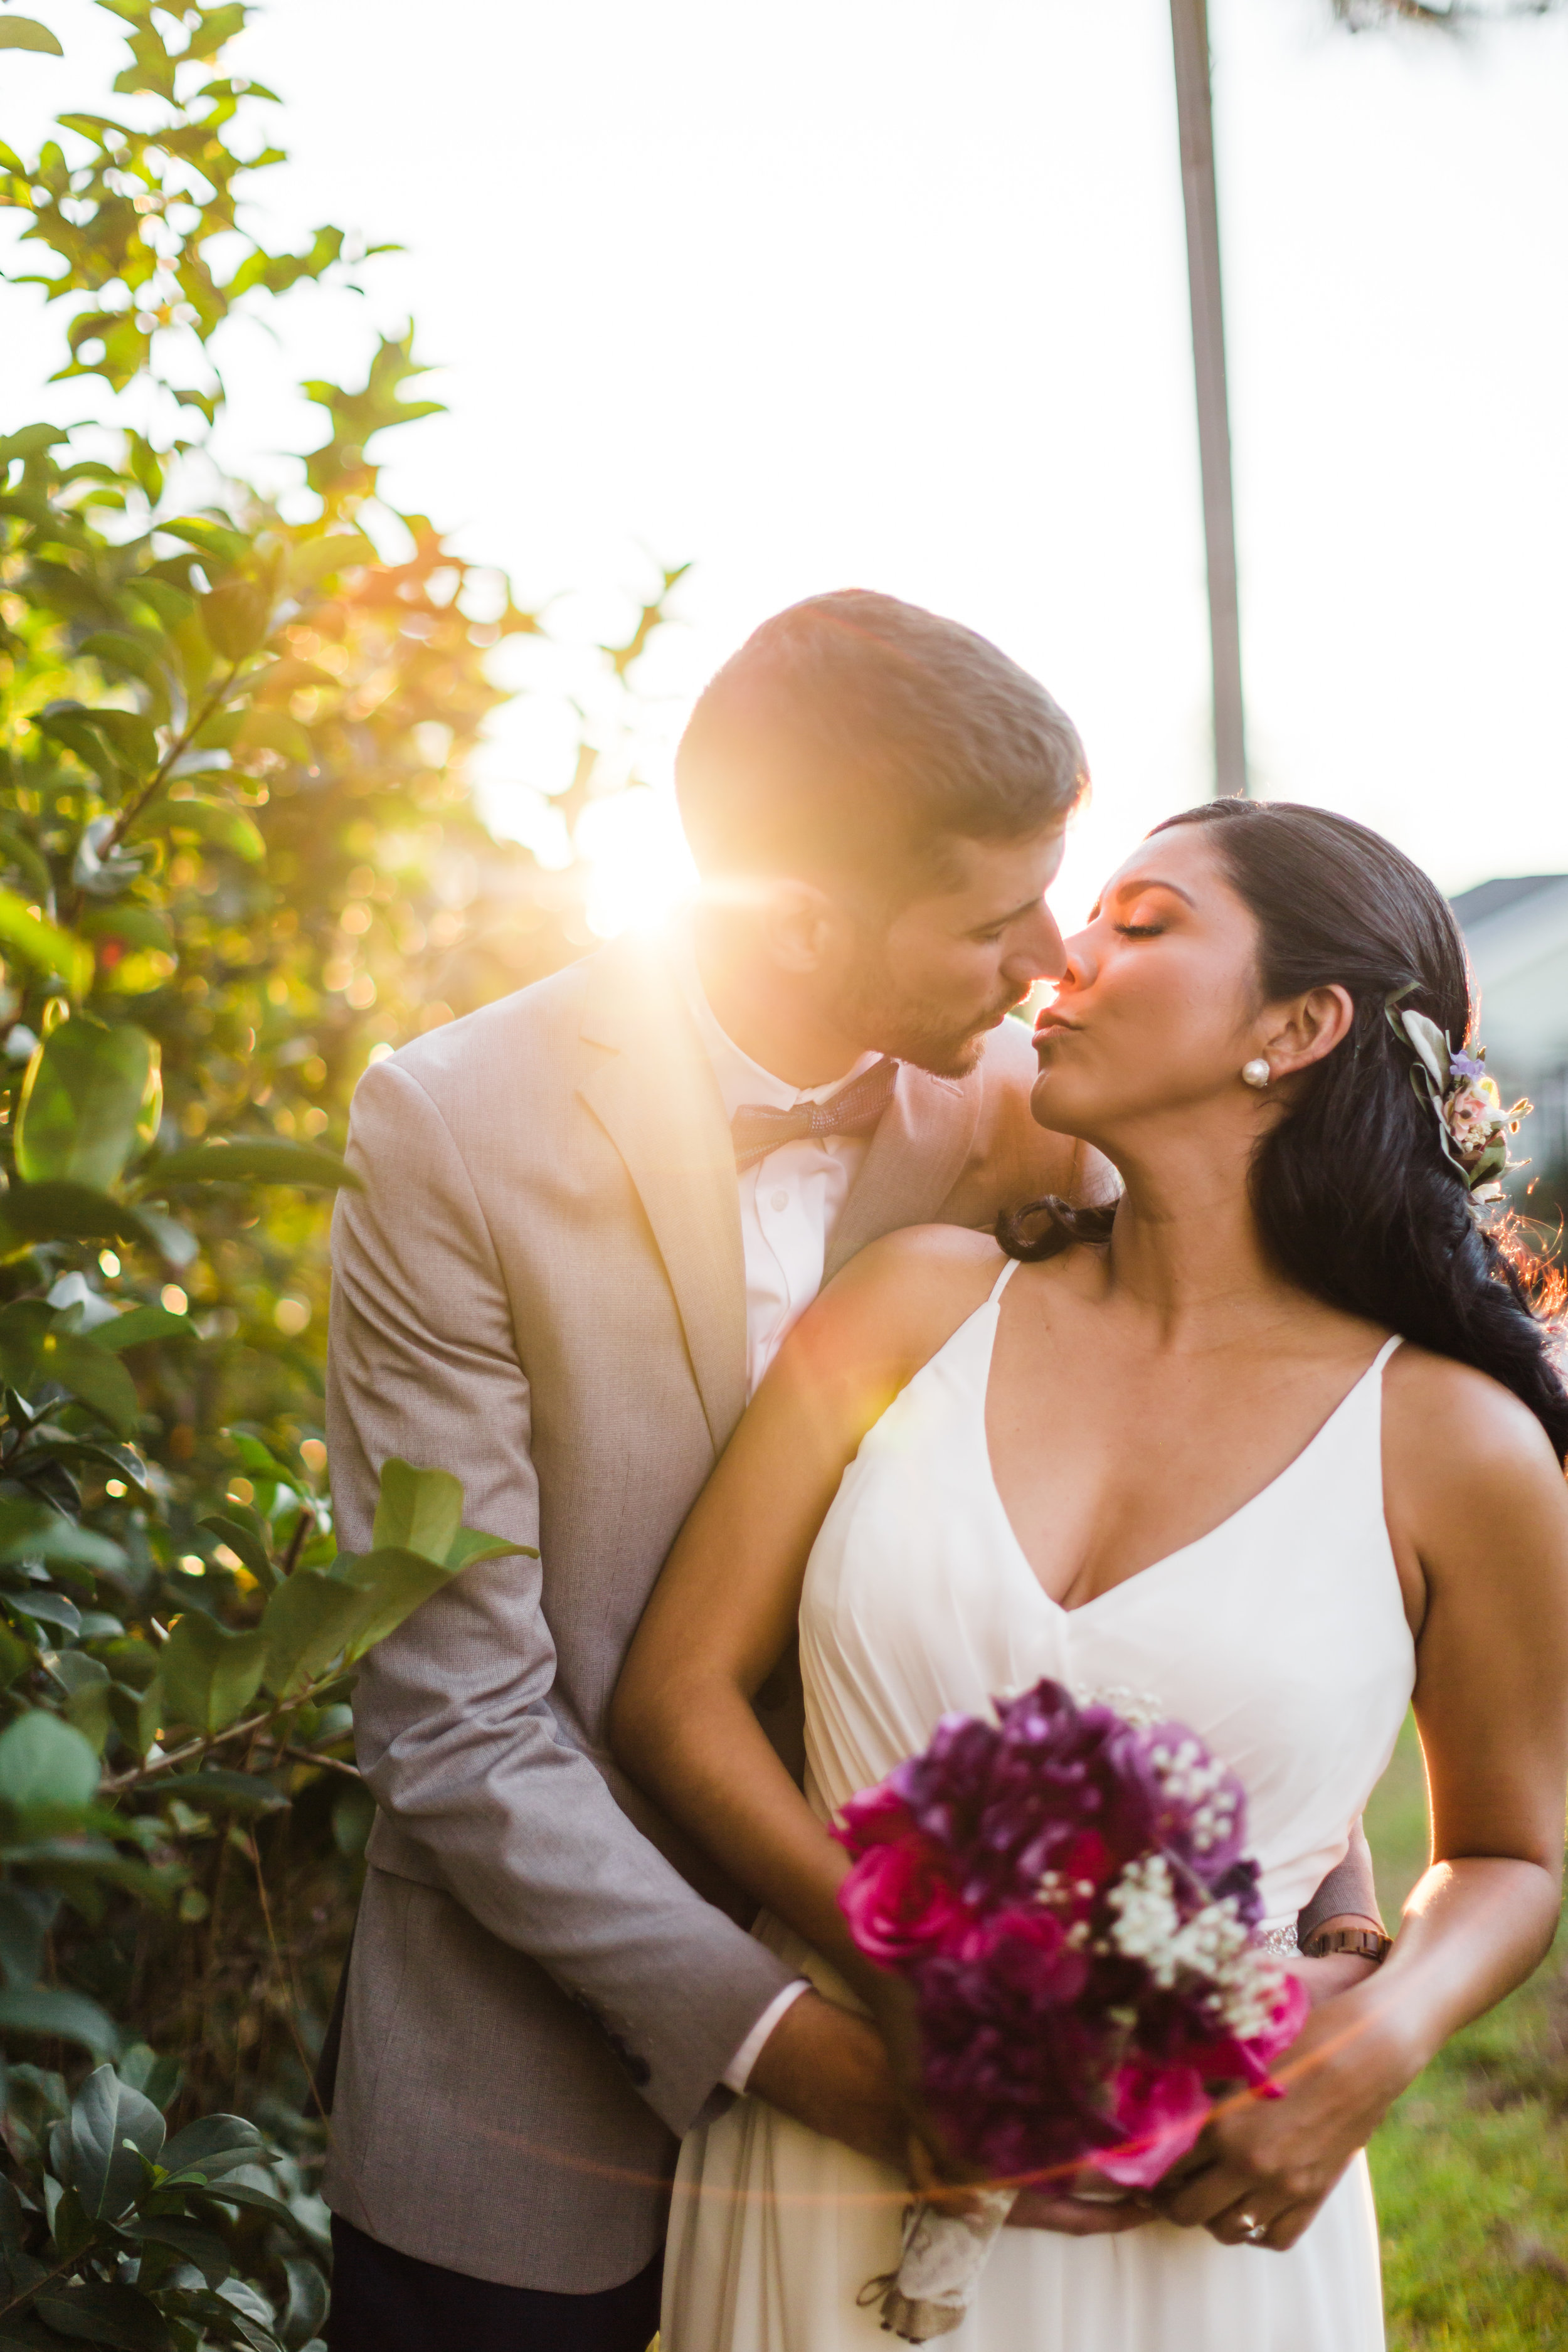 2018.11.03 Jael and Edel Ocala Wedding FINALS (312 of 441).jpg